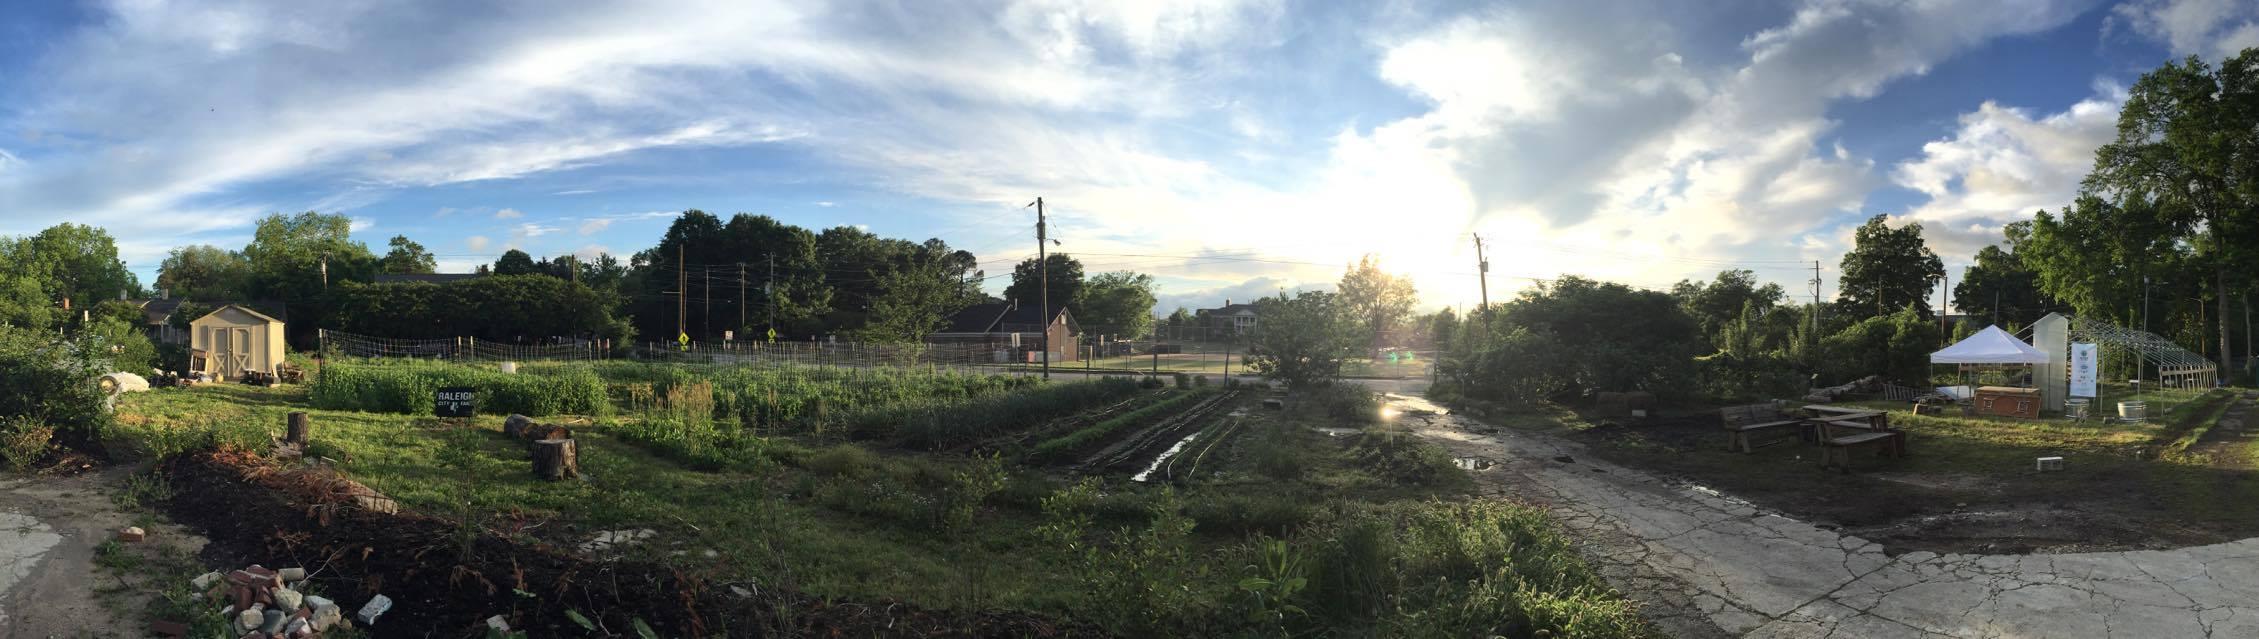 Raleigh City Farm - Raleigh, NC